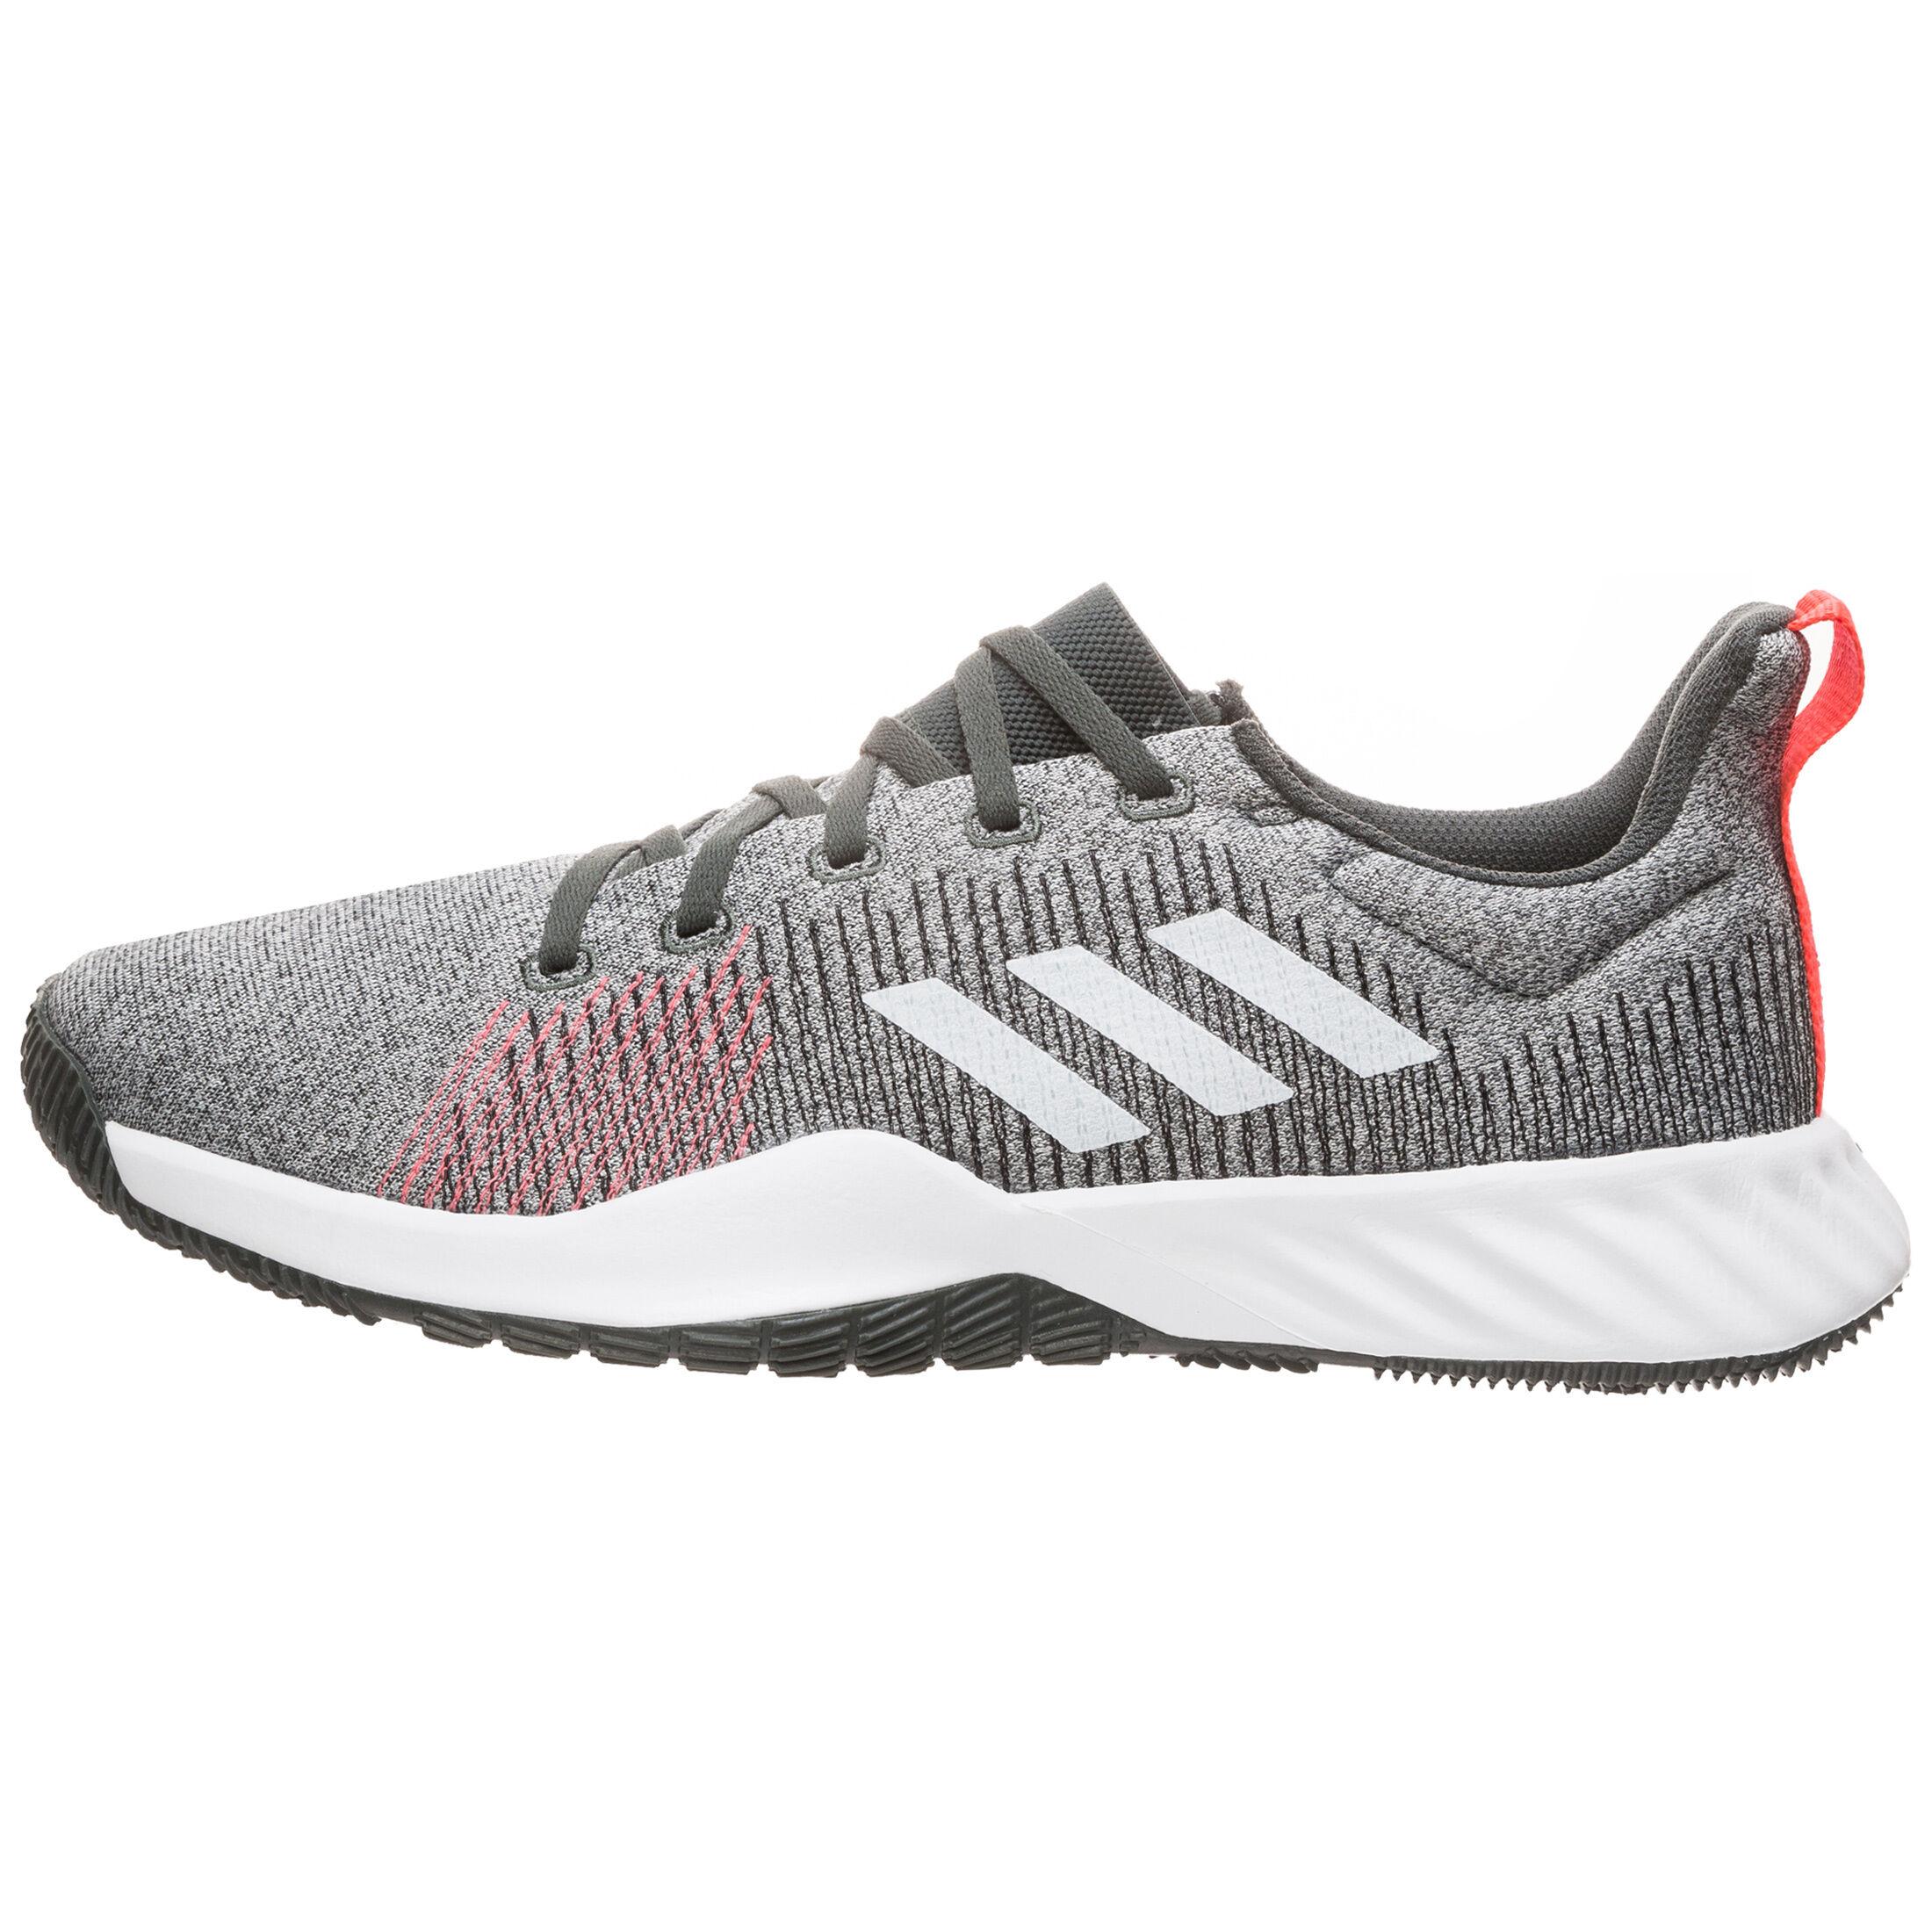 Adidas Outdoor Schuhe Herren Rot Schwarz K7478Adidas Schuhe